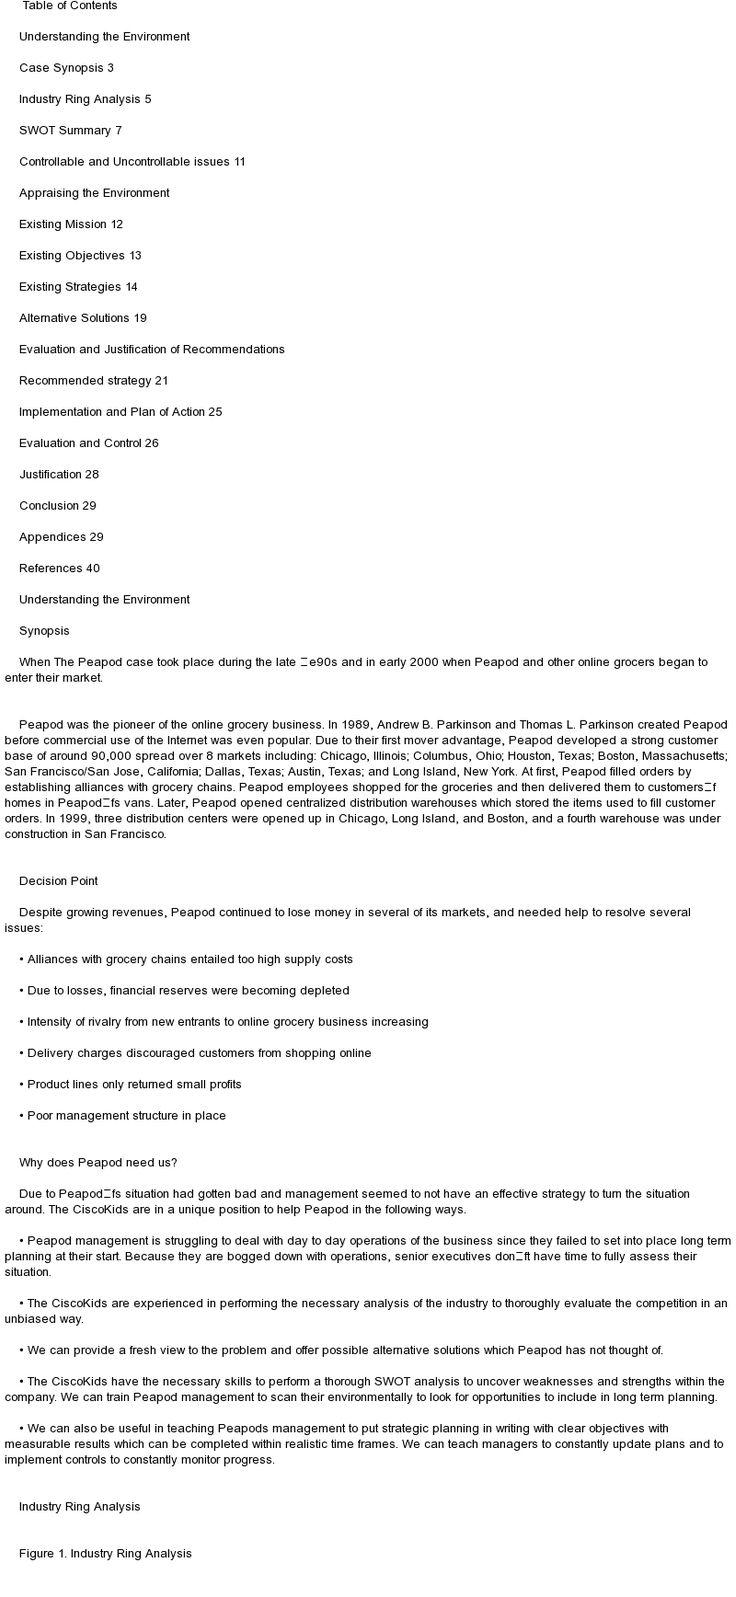 dissertation powerpoint presentation templates